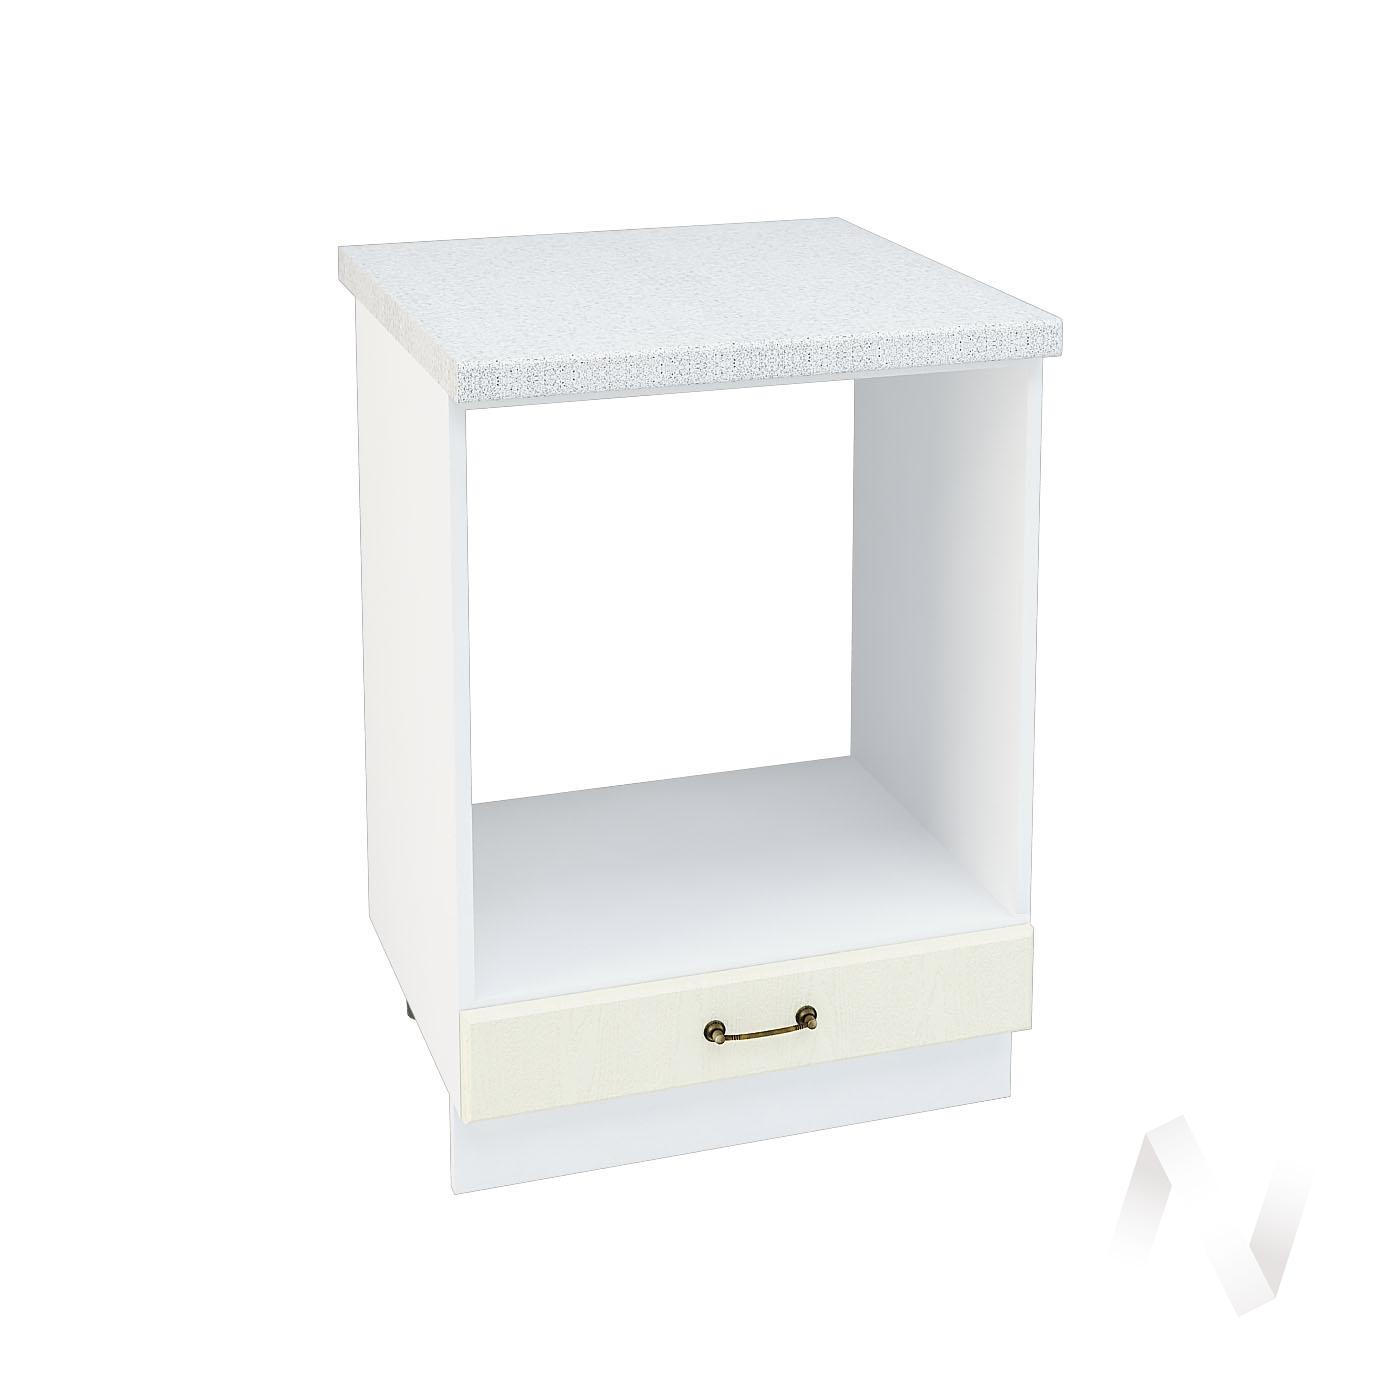 "Кухня ""Ницца"": Шкаф нижний под духовку 600, ШНД 600 (Крем/корпус белый)"